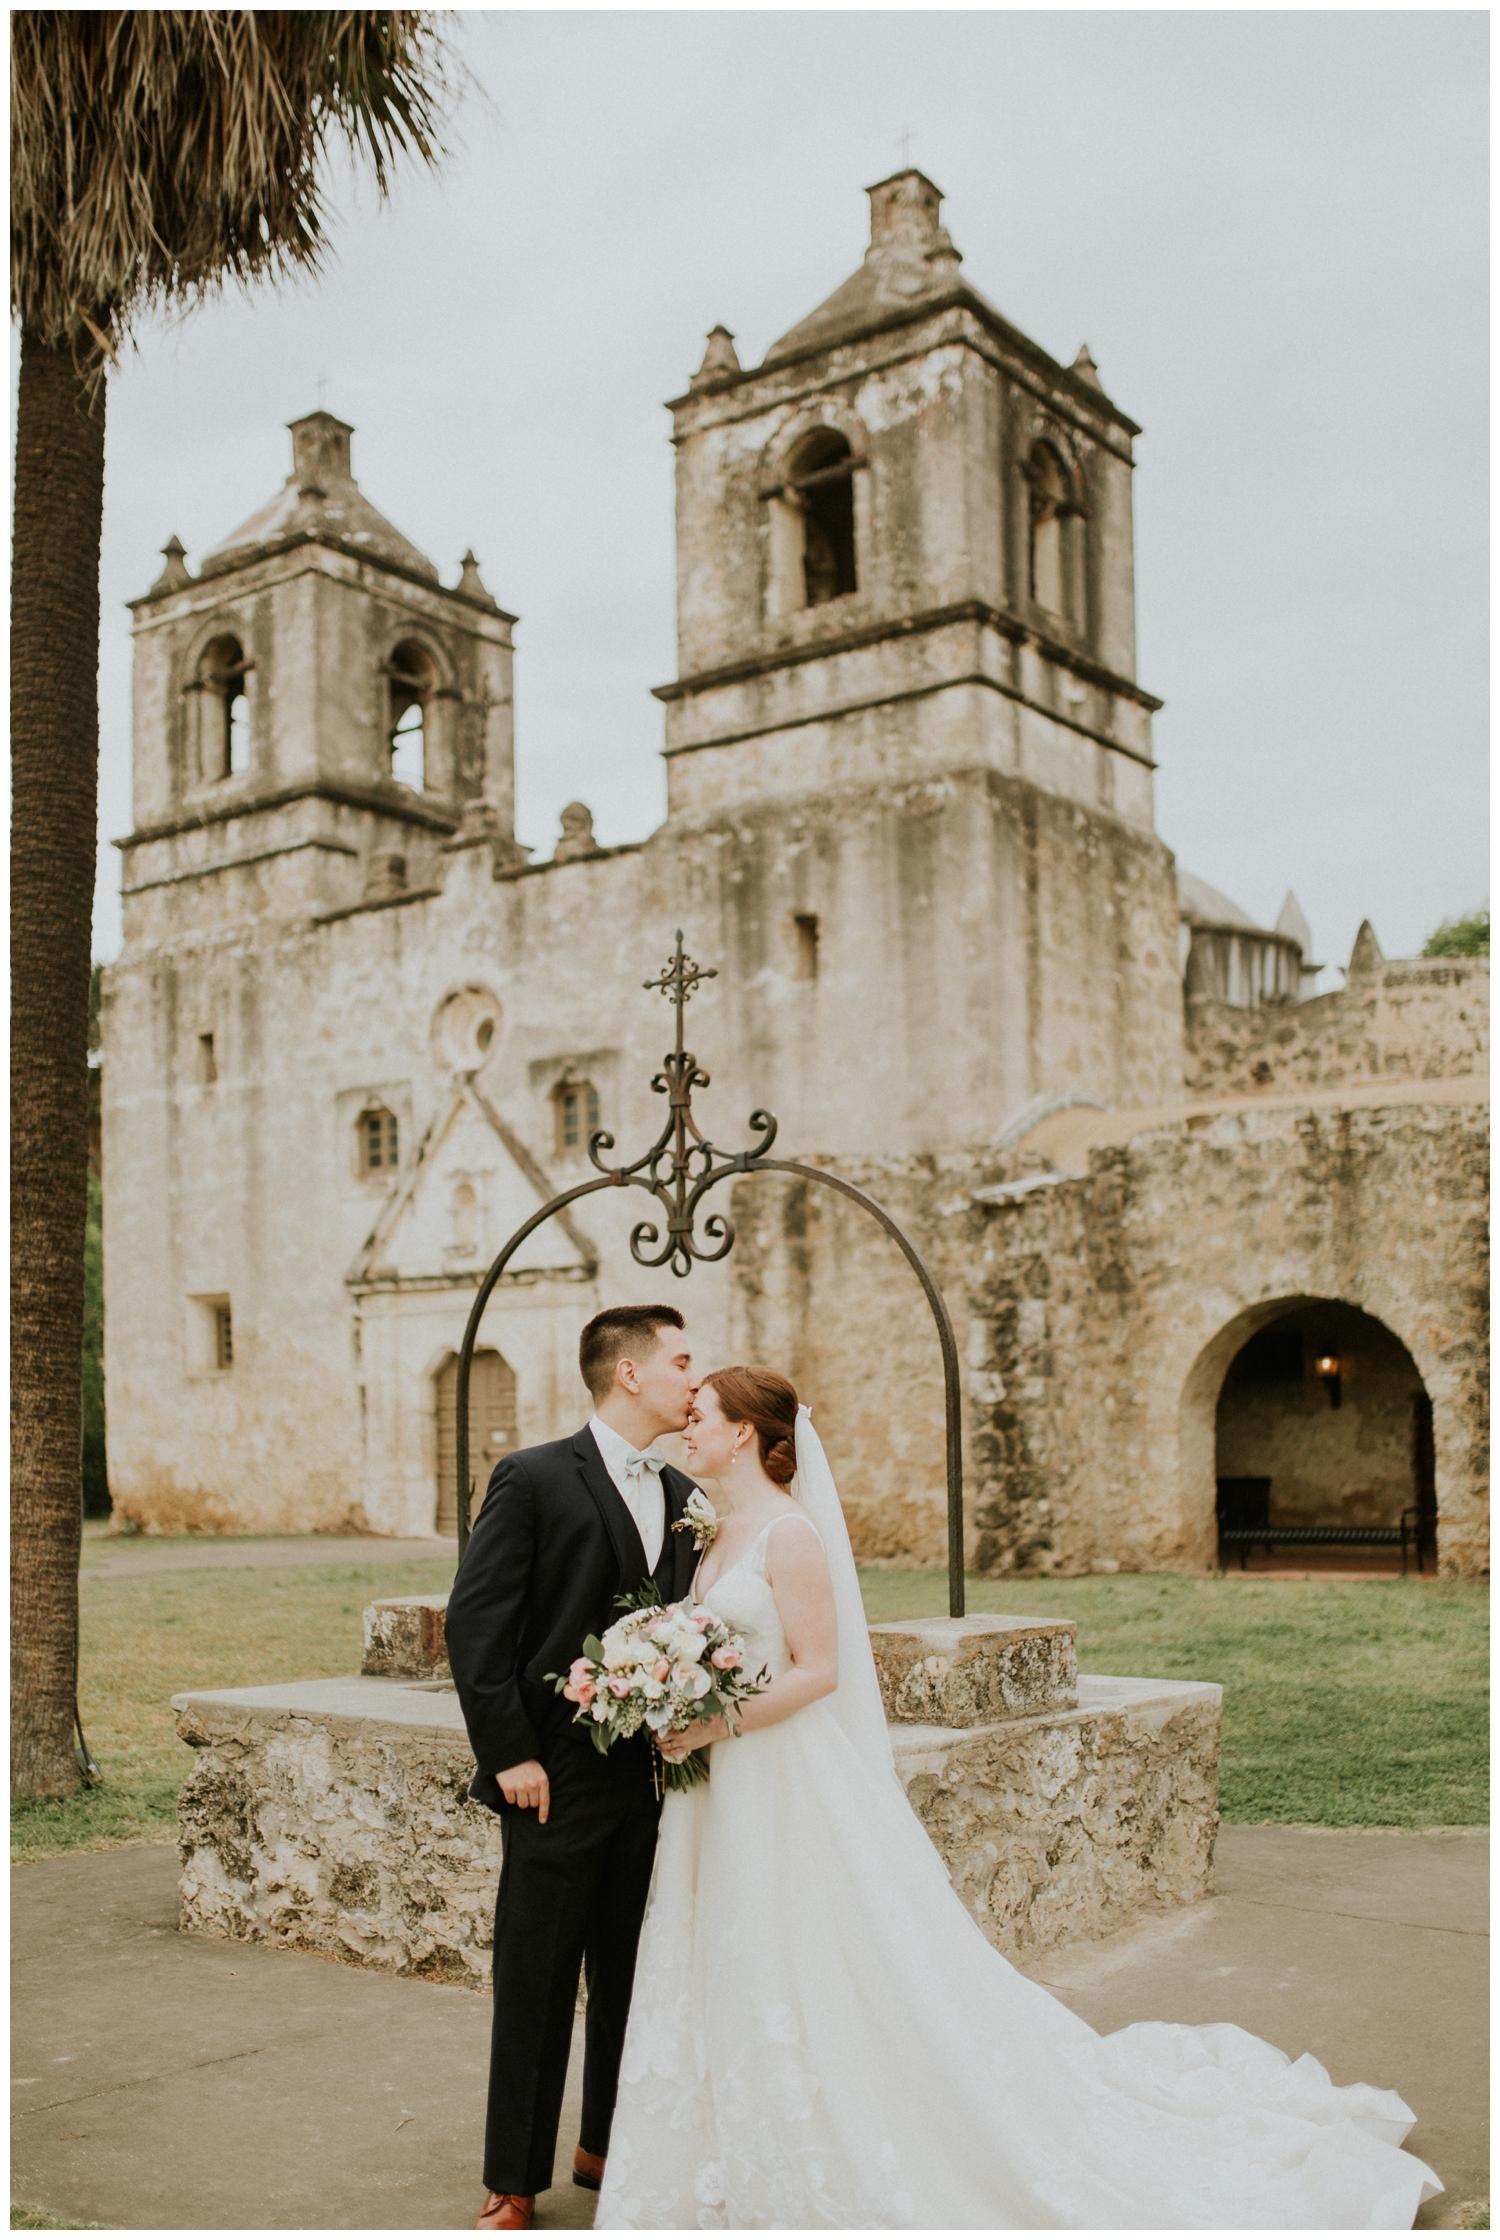 Jenna+Brandon, Mission Concepcion Wedding, San Antonio, Contista Productions Wedding Photography_0087.jpg